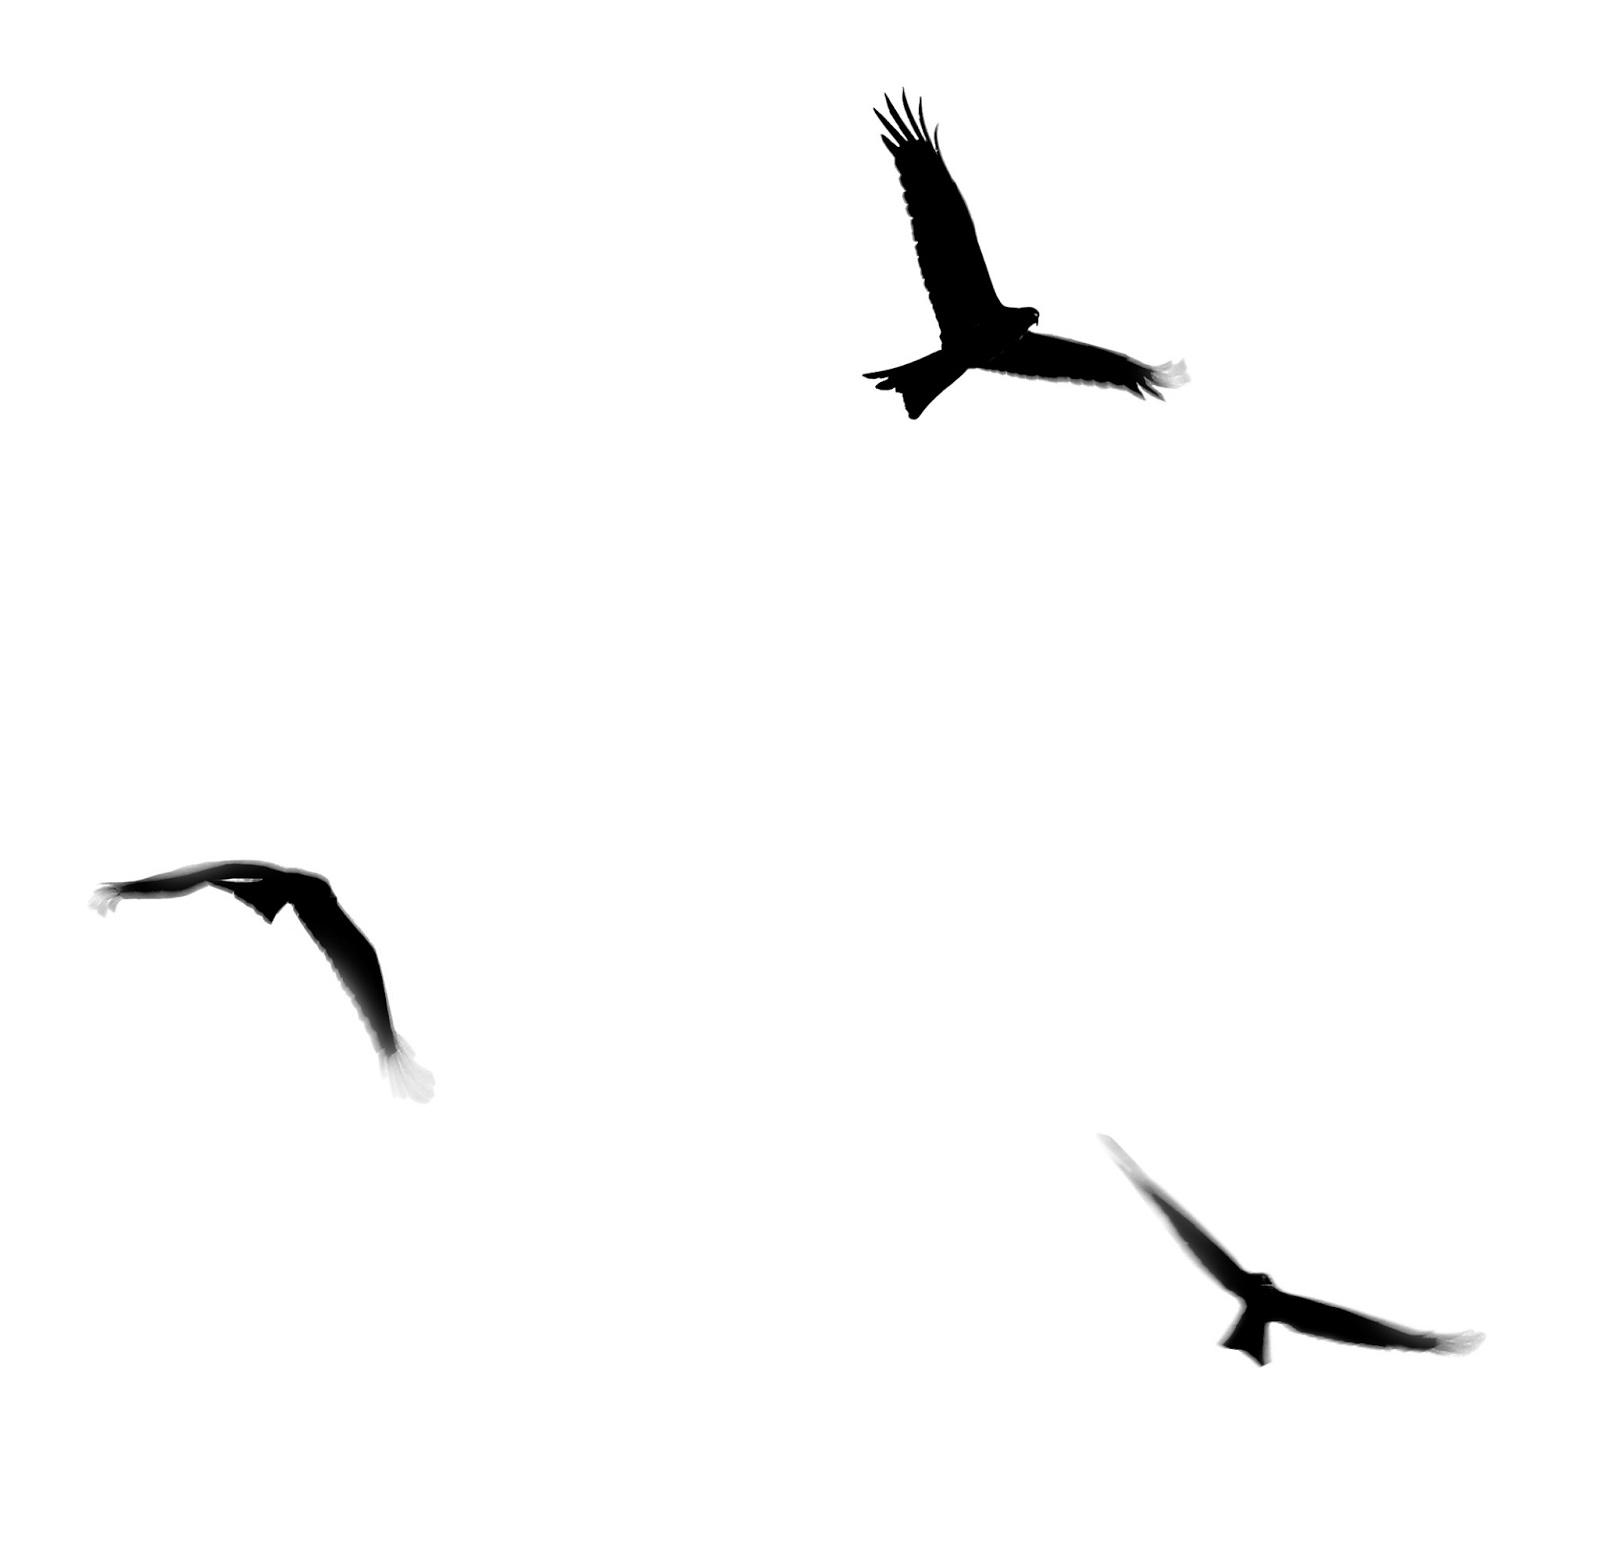 Bird in flight silhouette - photo#3